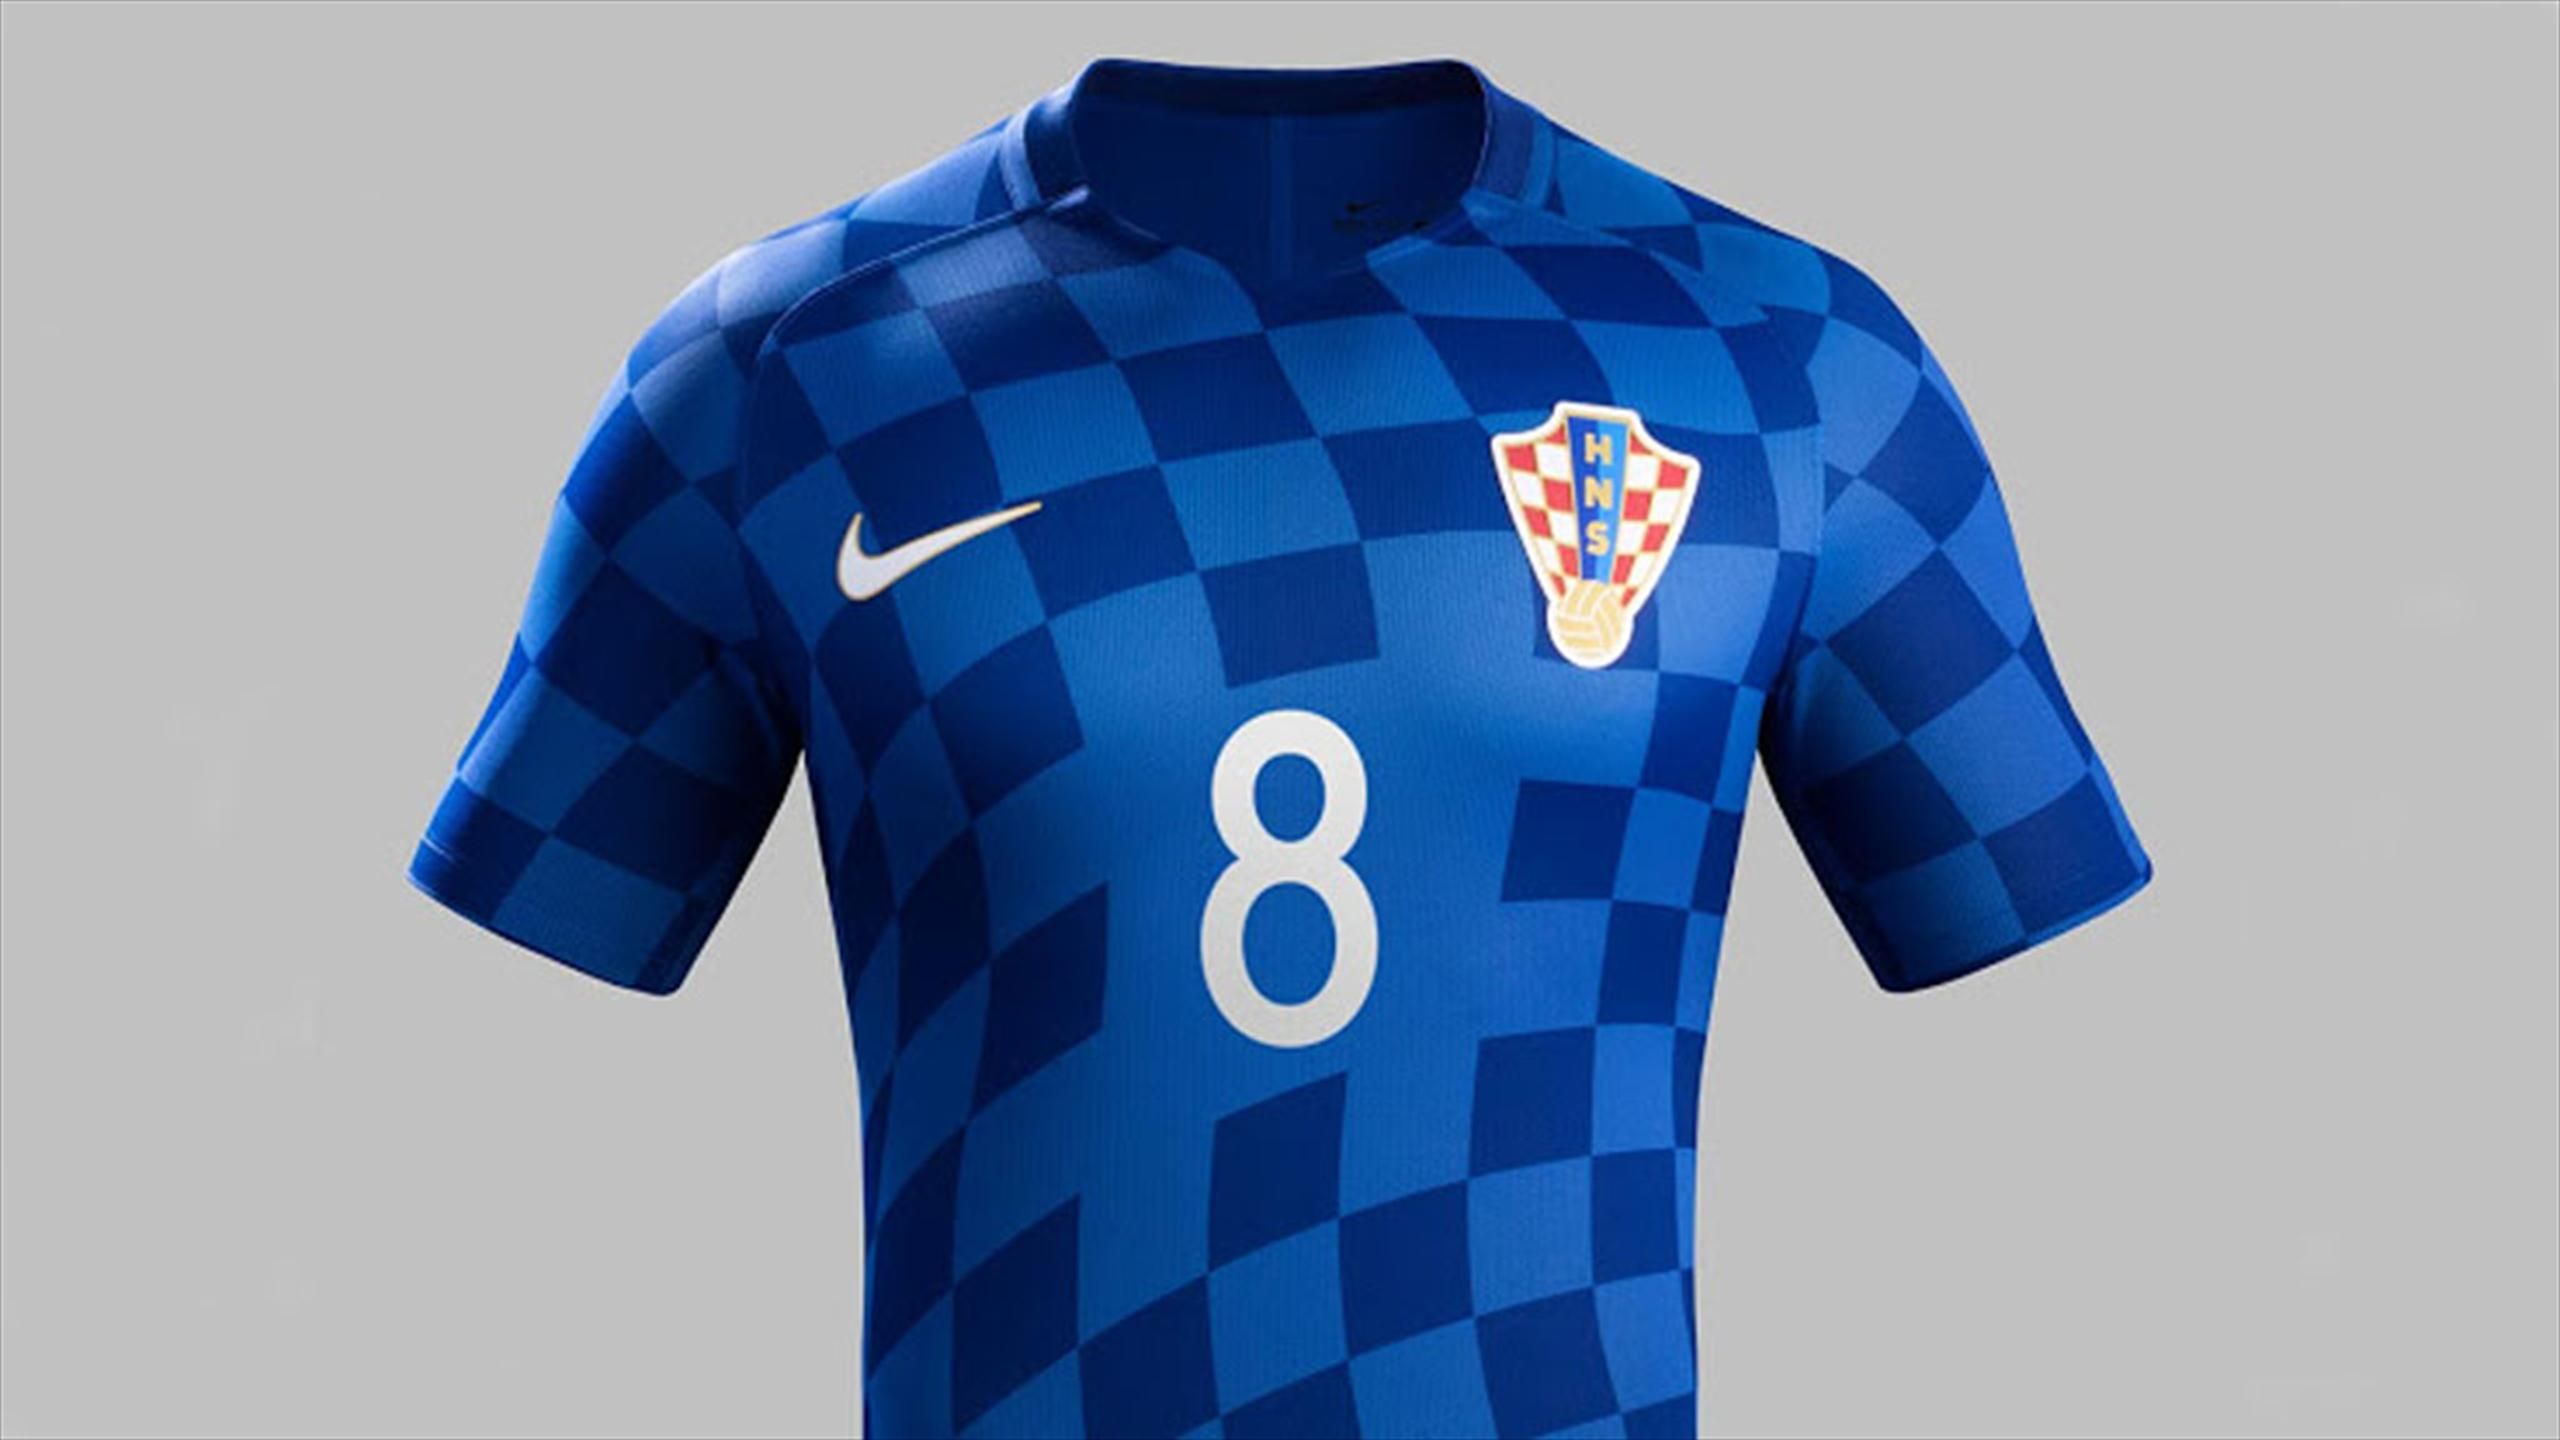 Maillot equipe de croatie Tenue de match